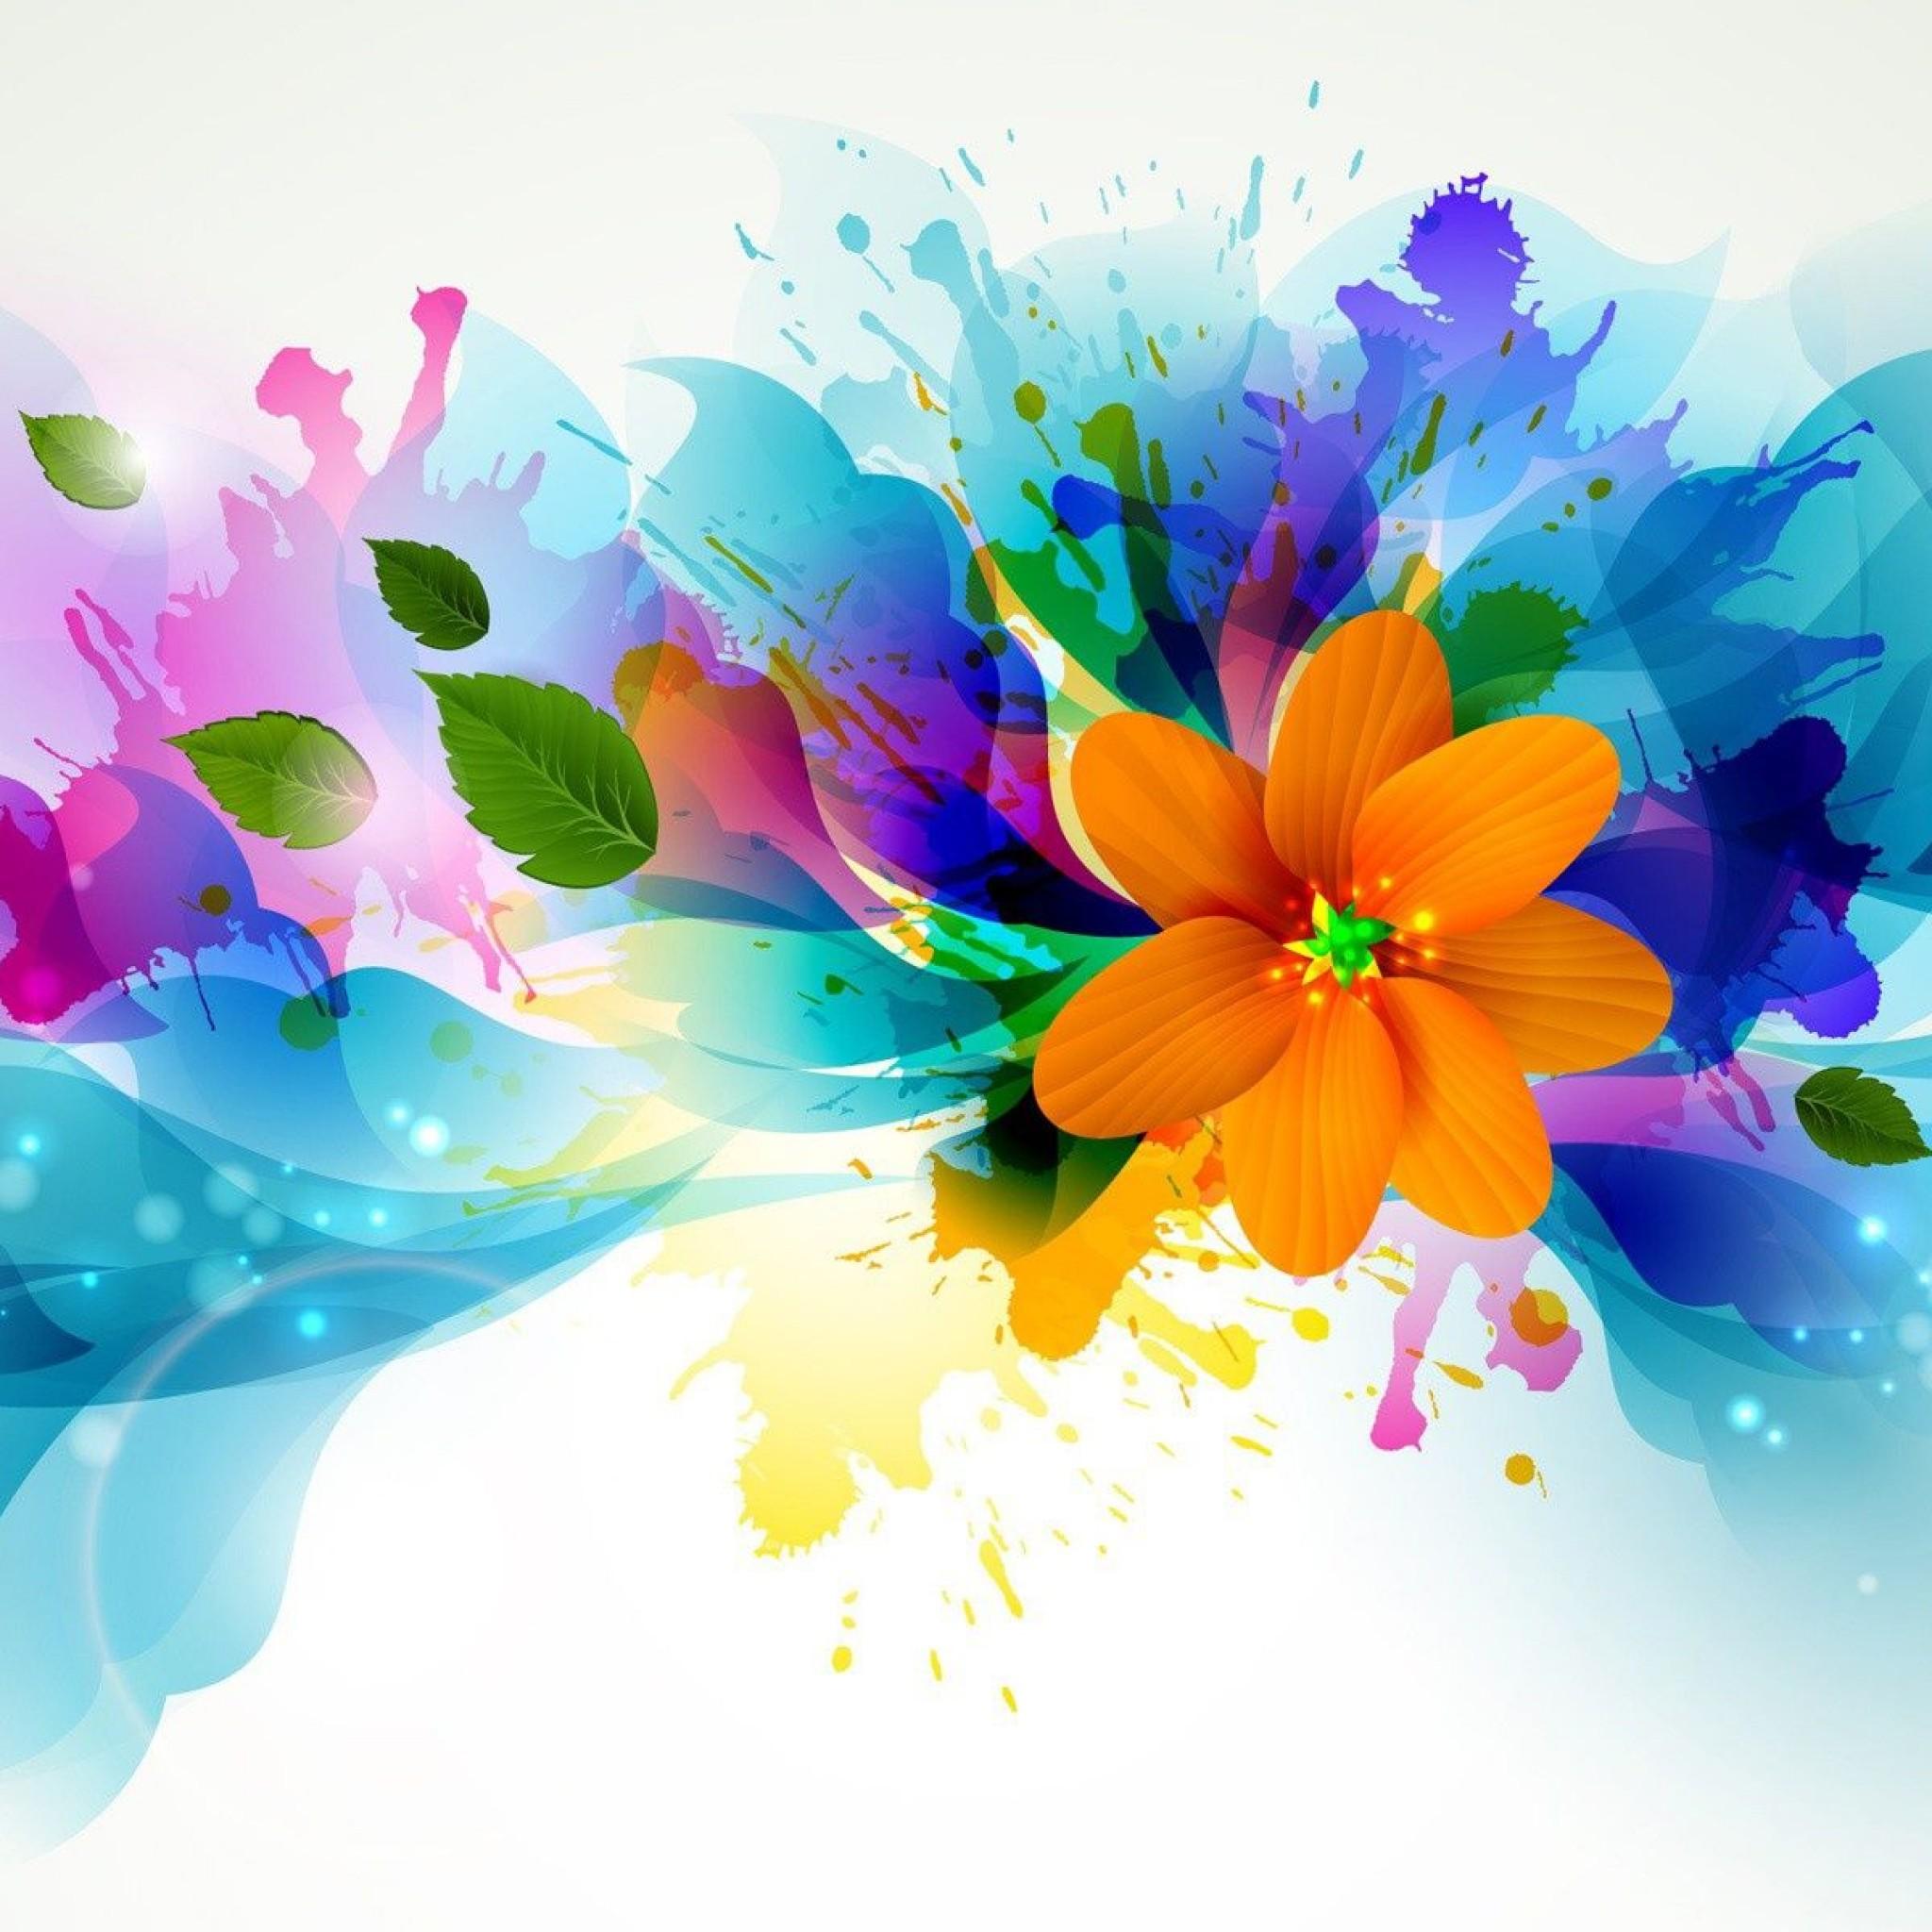 [48+] Abstract Flower Wallpaper On WallpaperSafari